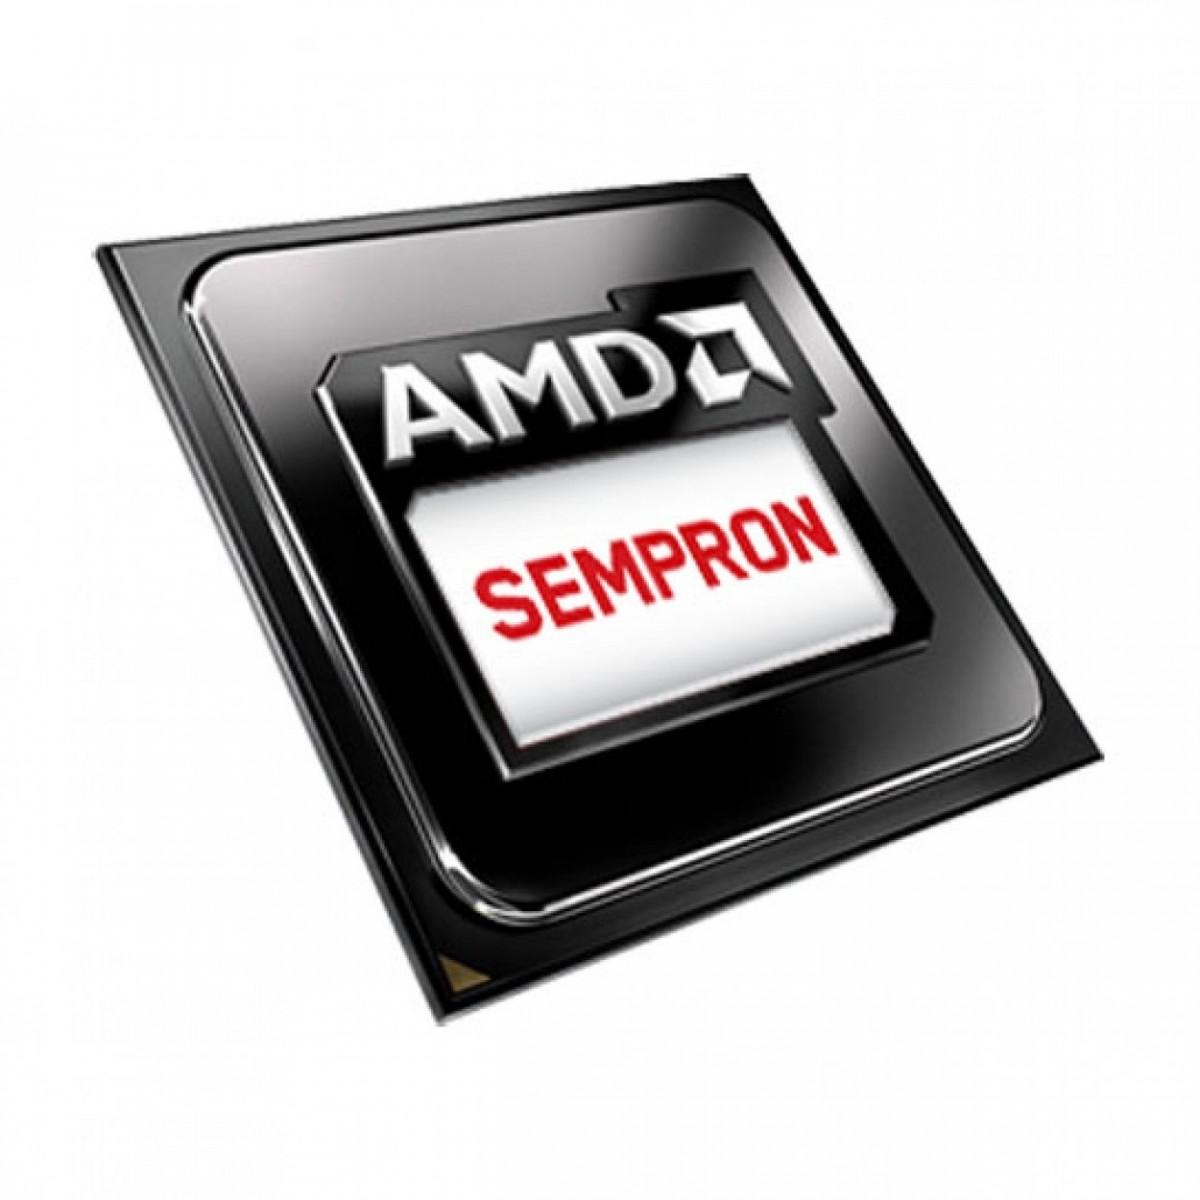 Processador AMD Sempron 2800+ 256K Cache / 1600 MHz / 800 MHz - Seminovo